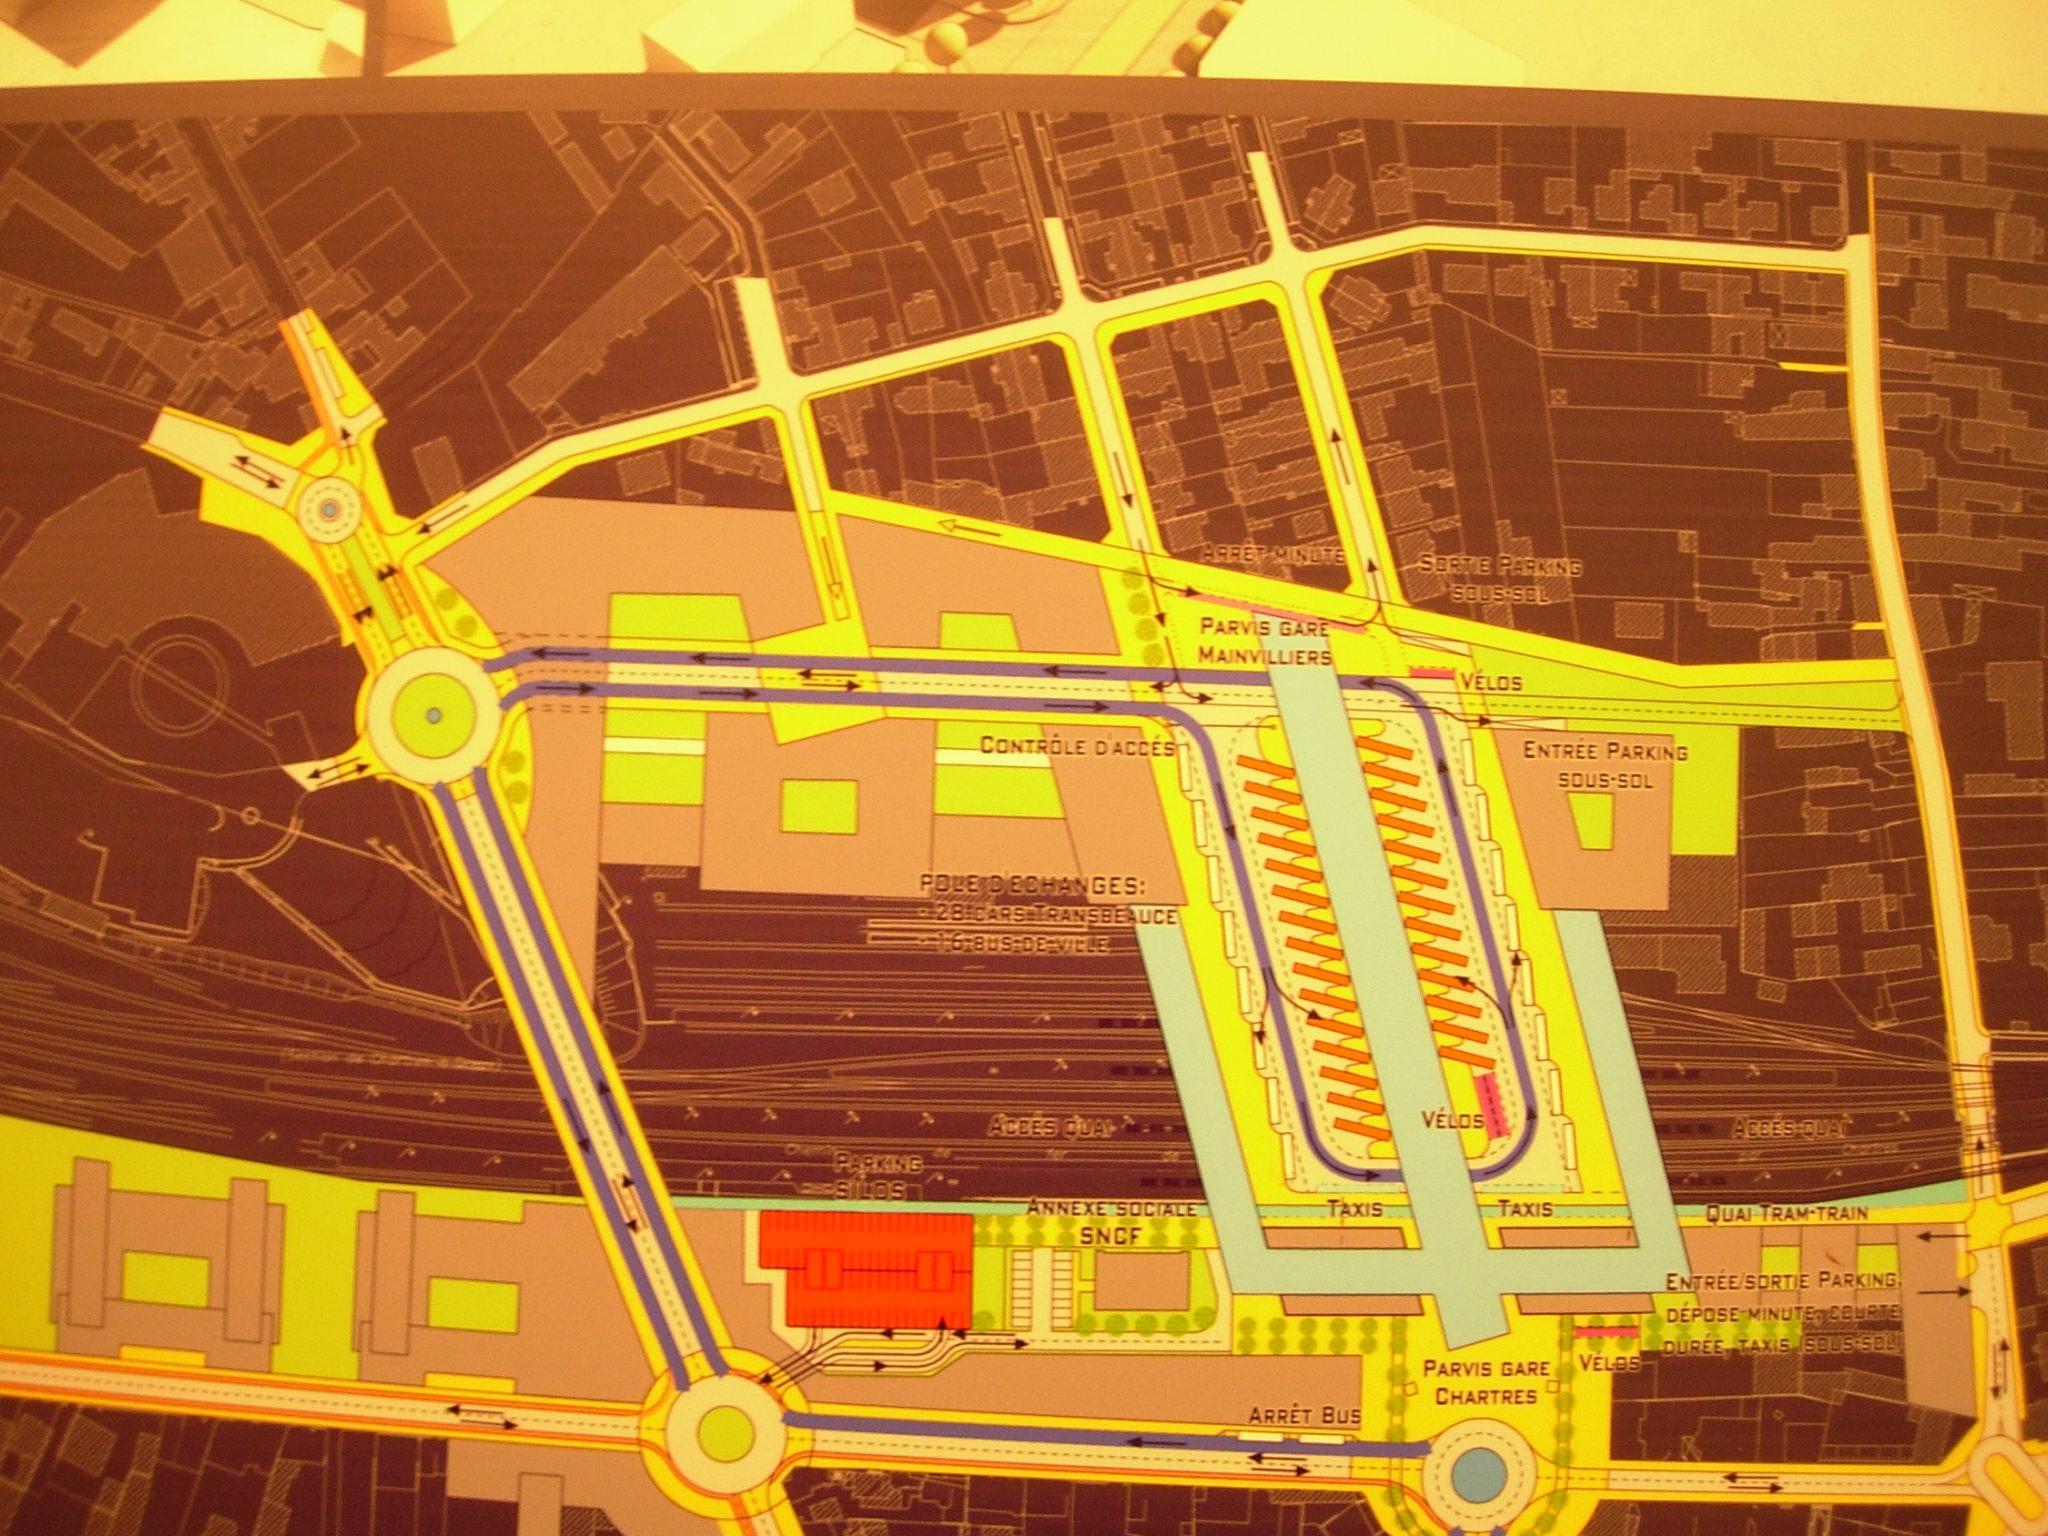 Projet 2007 Plan de circulation